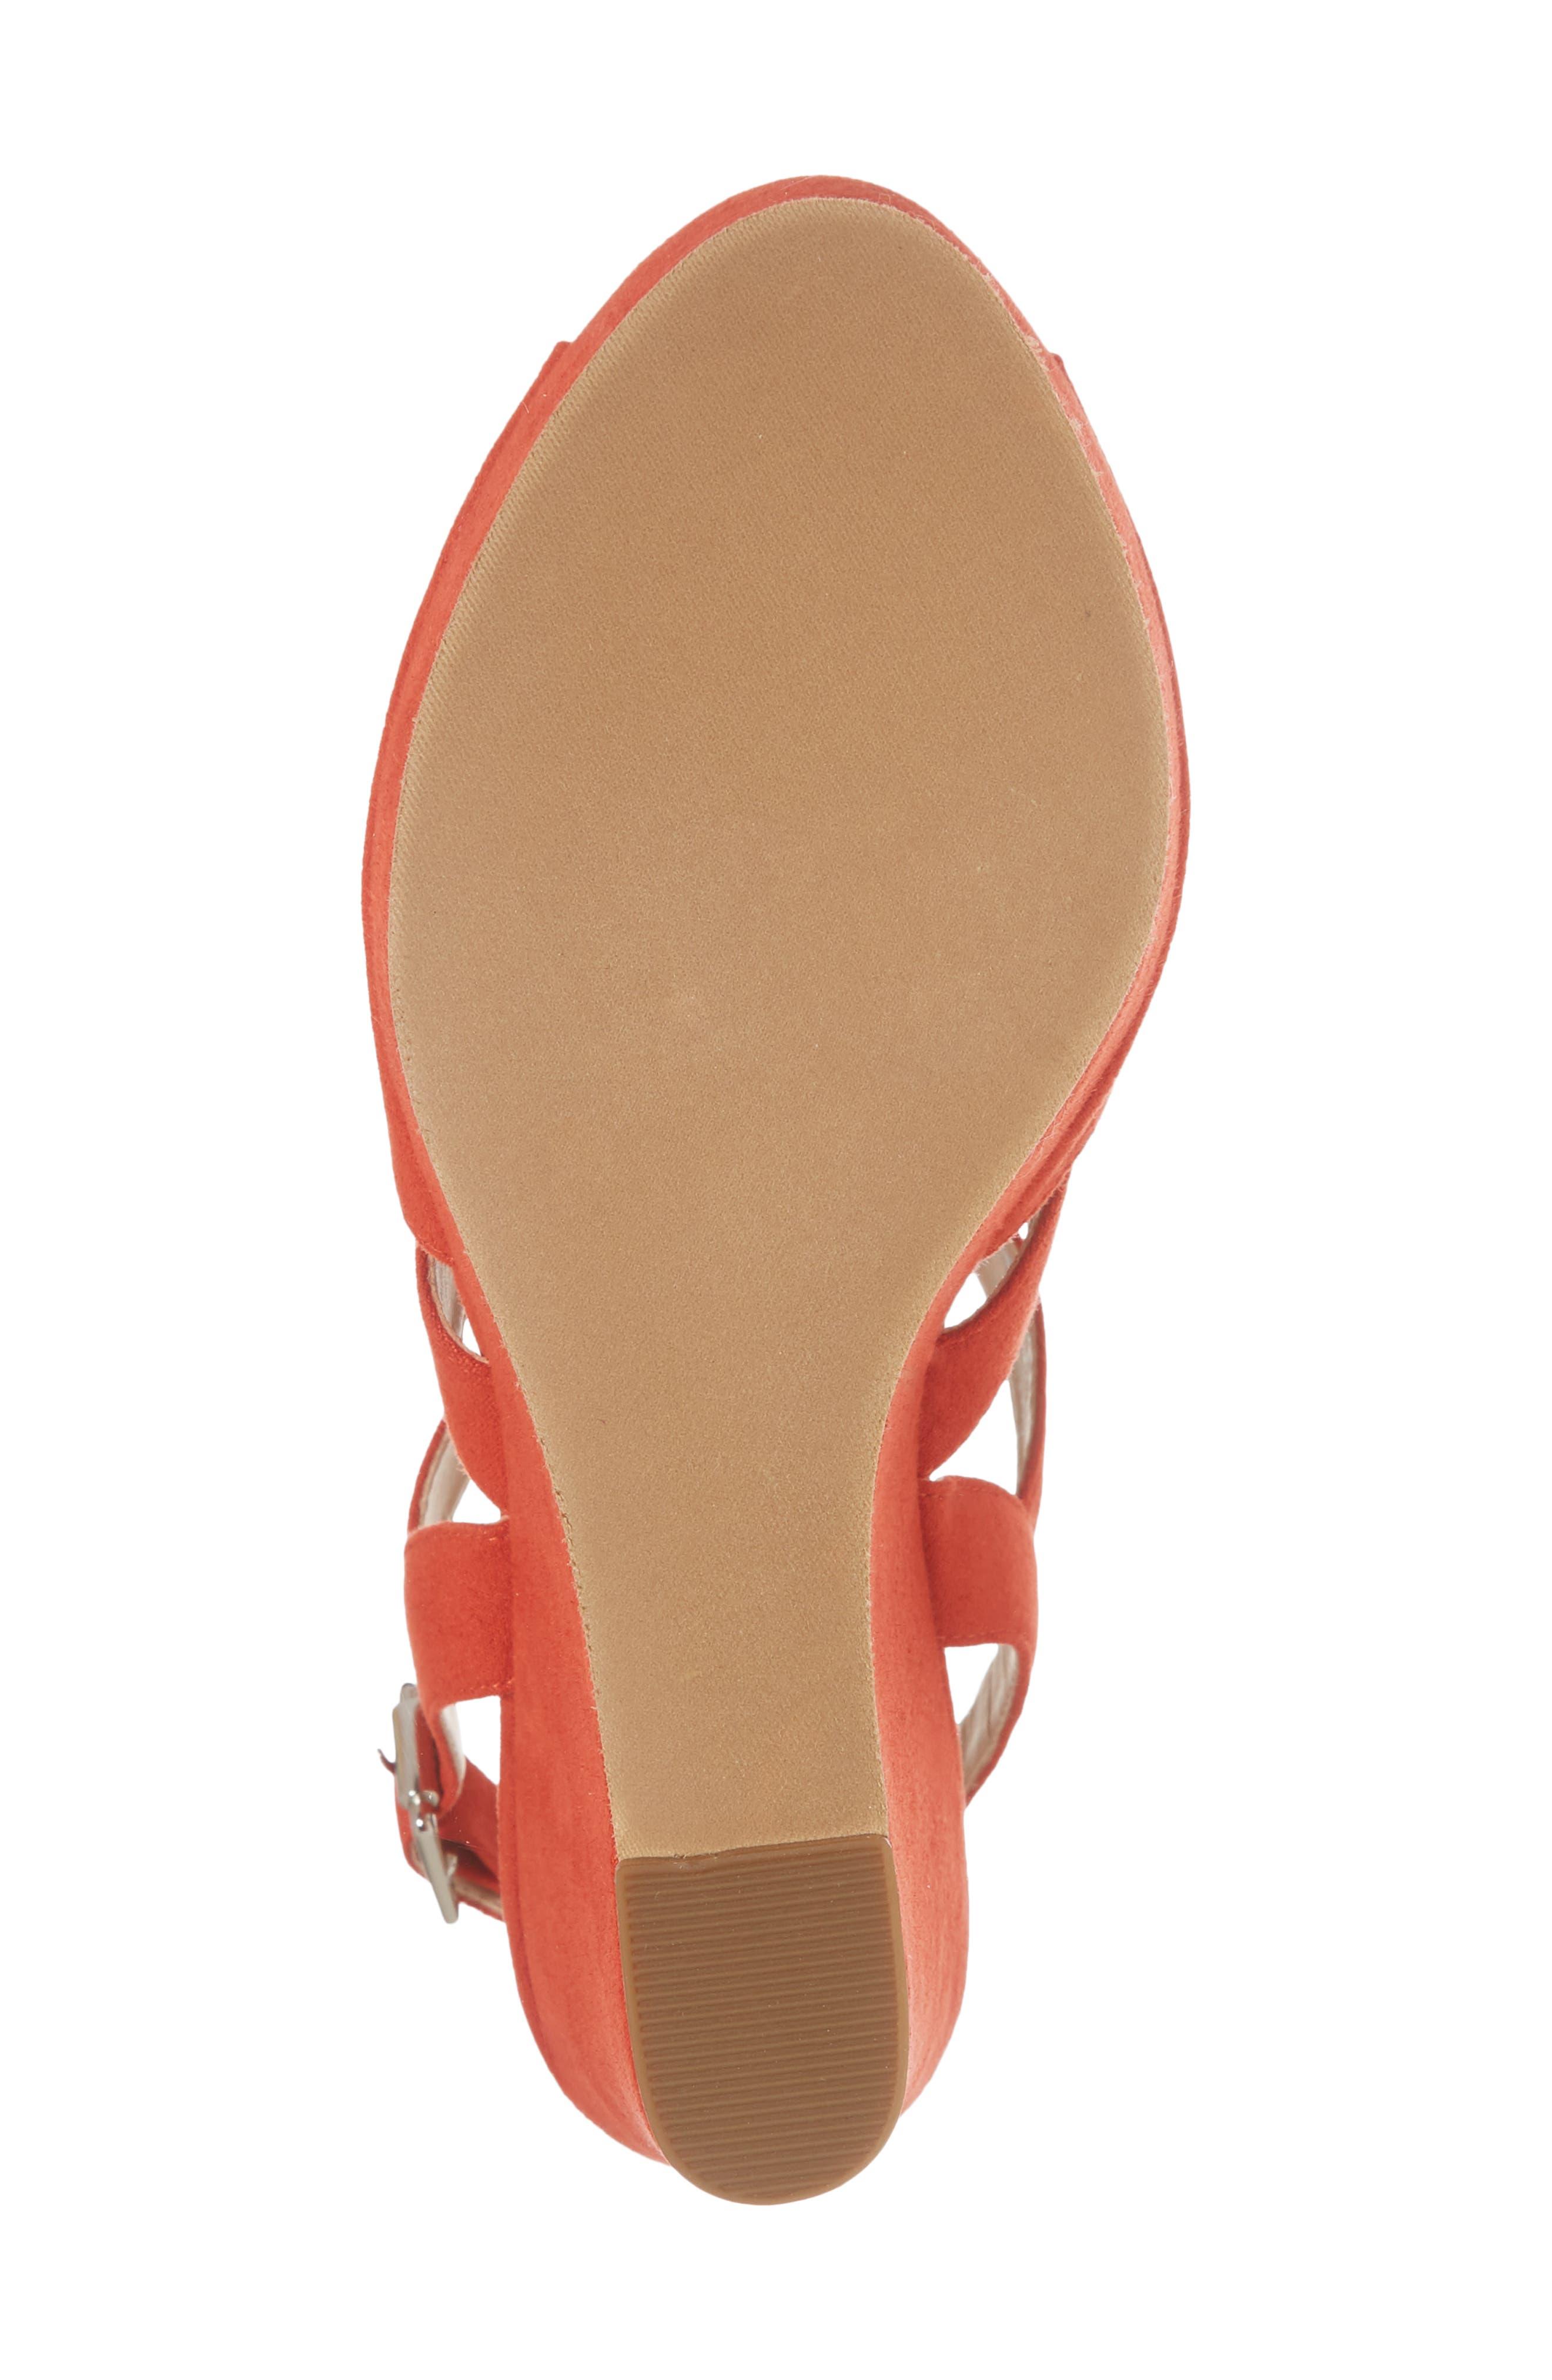 Sunny Platform Wedge Sandal,                             Alternate thumbnail 36, color,